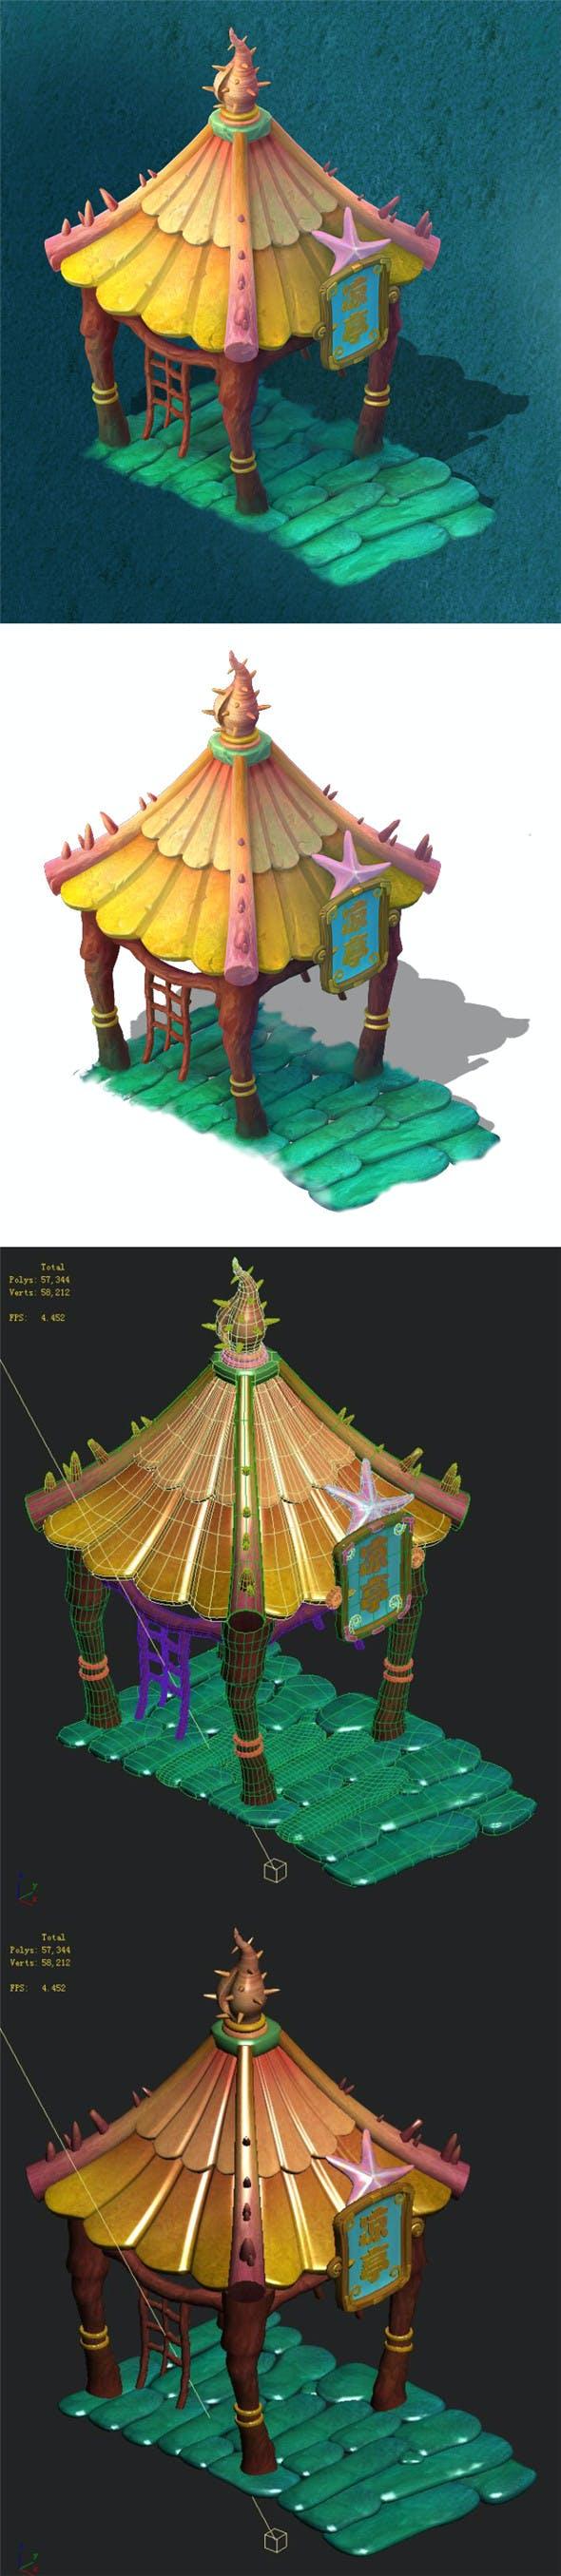 Submarine cartoon world - sea bottom pavilion - 3DOcean Item for Sale